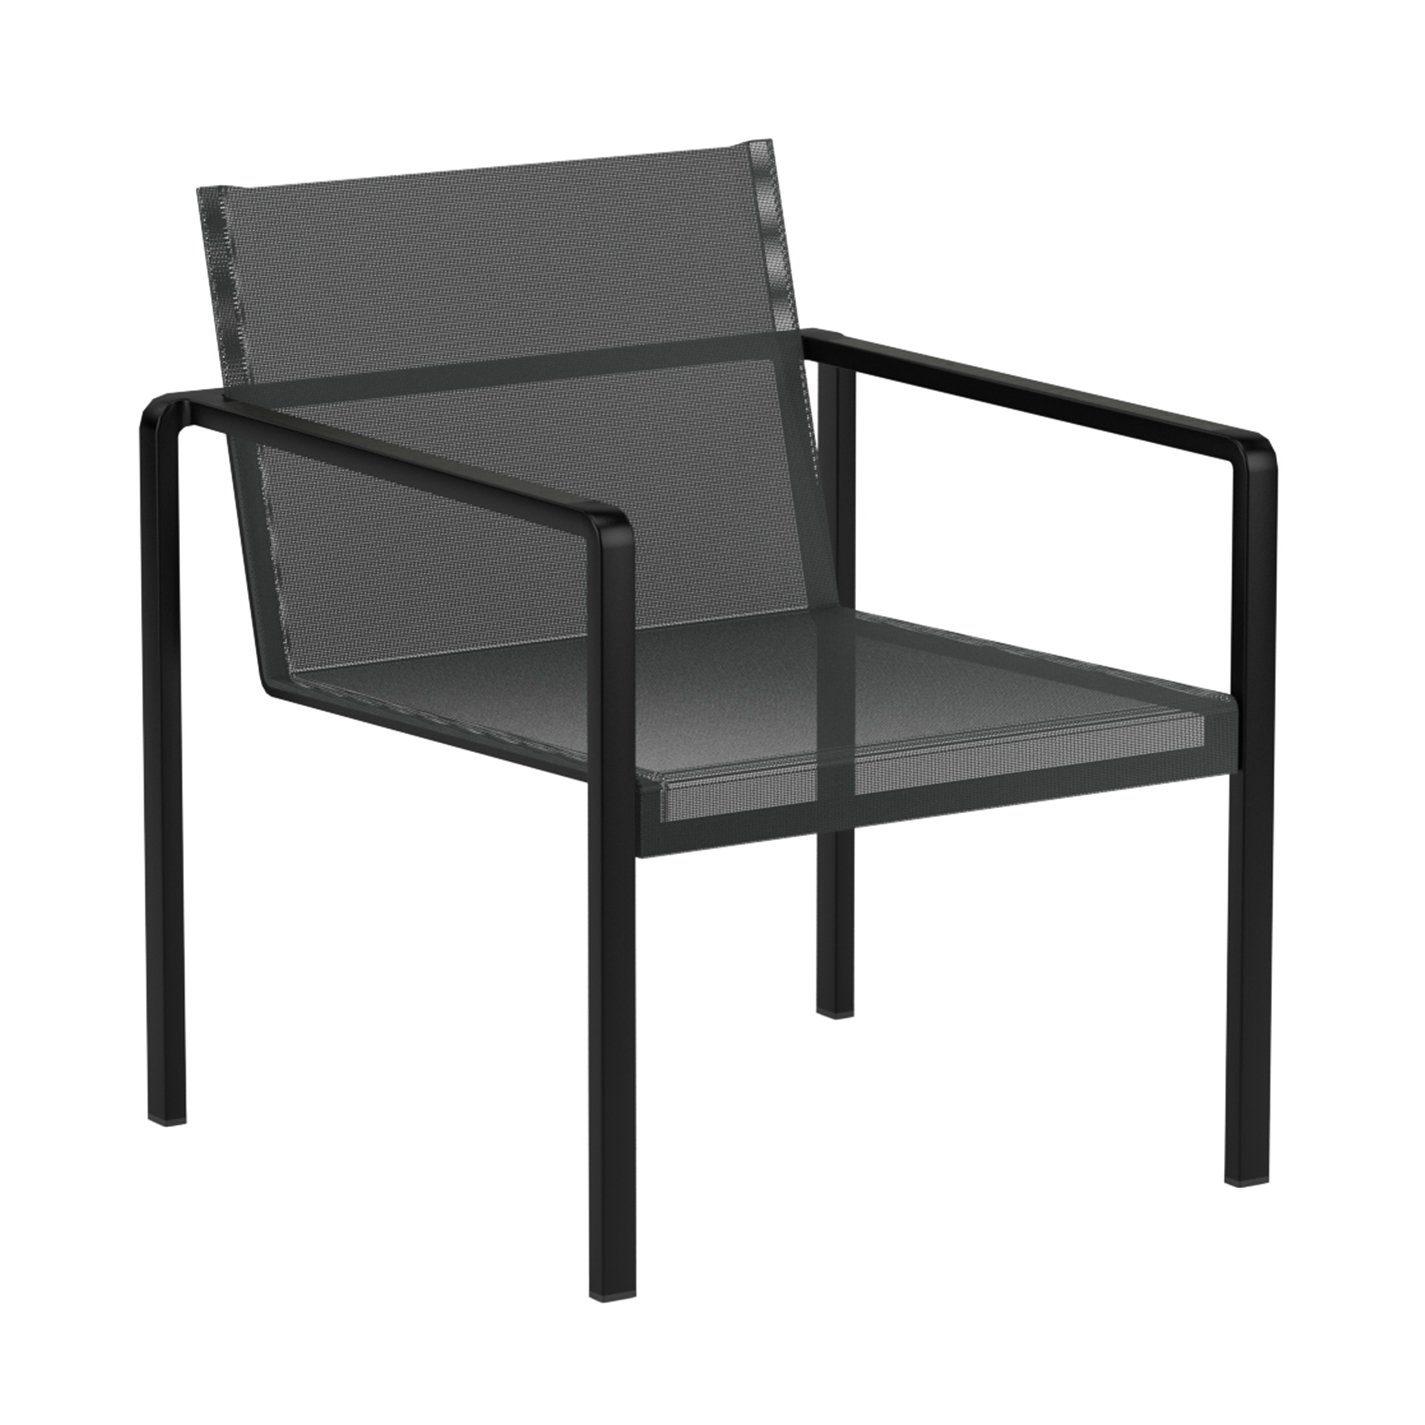 "Royal Botania Loungesessel ""Alura"", Gestell Aluminium schwarz, Sitzflächen-Bespannung Textilgewebe schwarz"